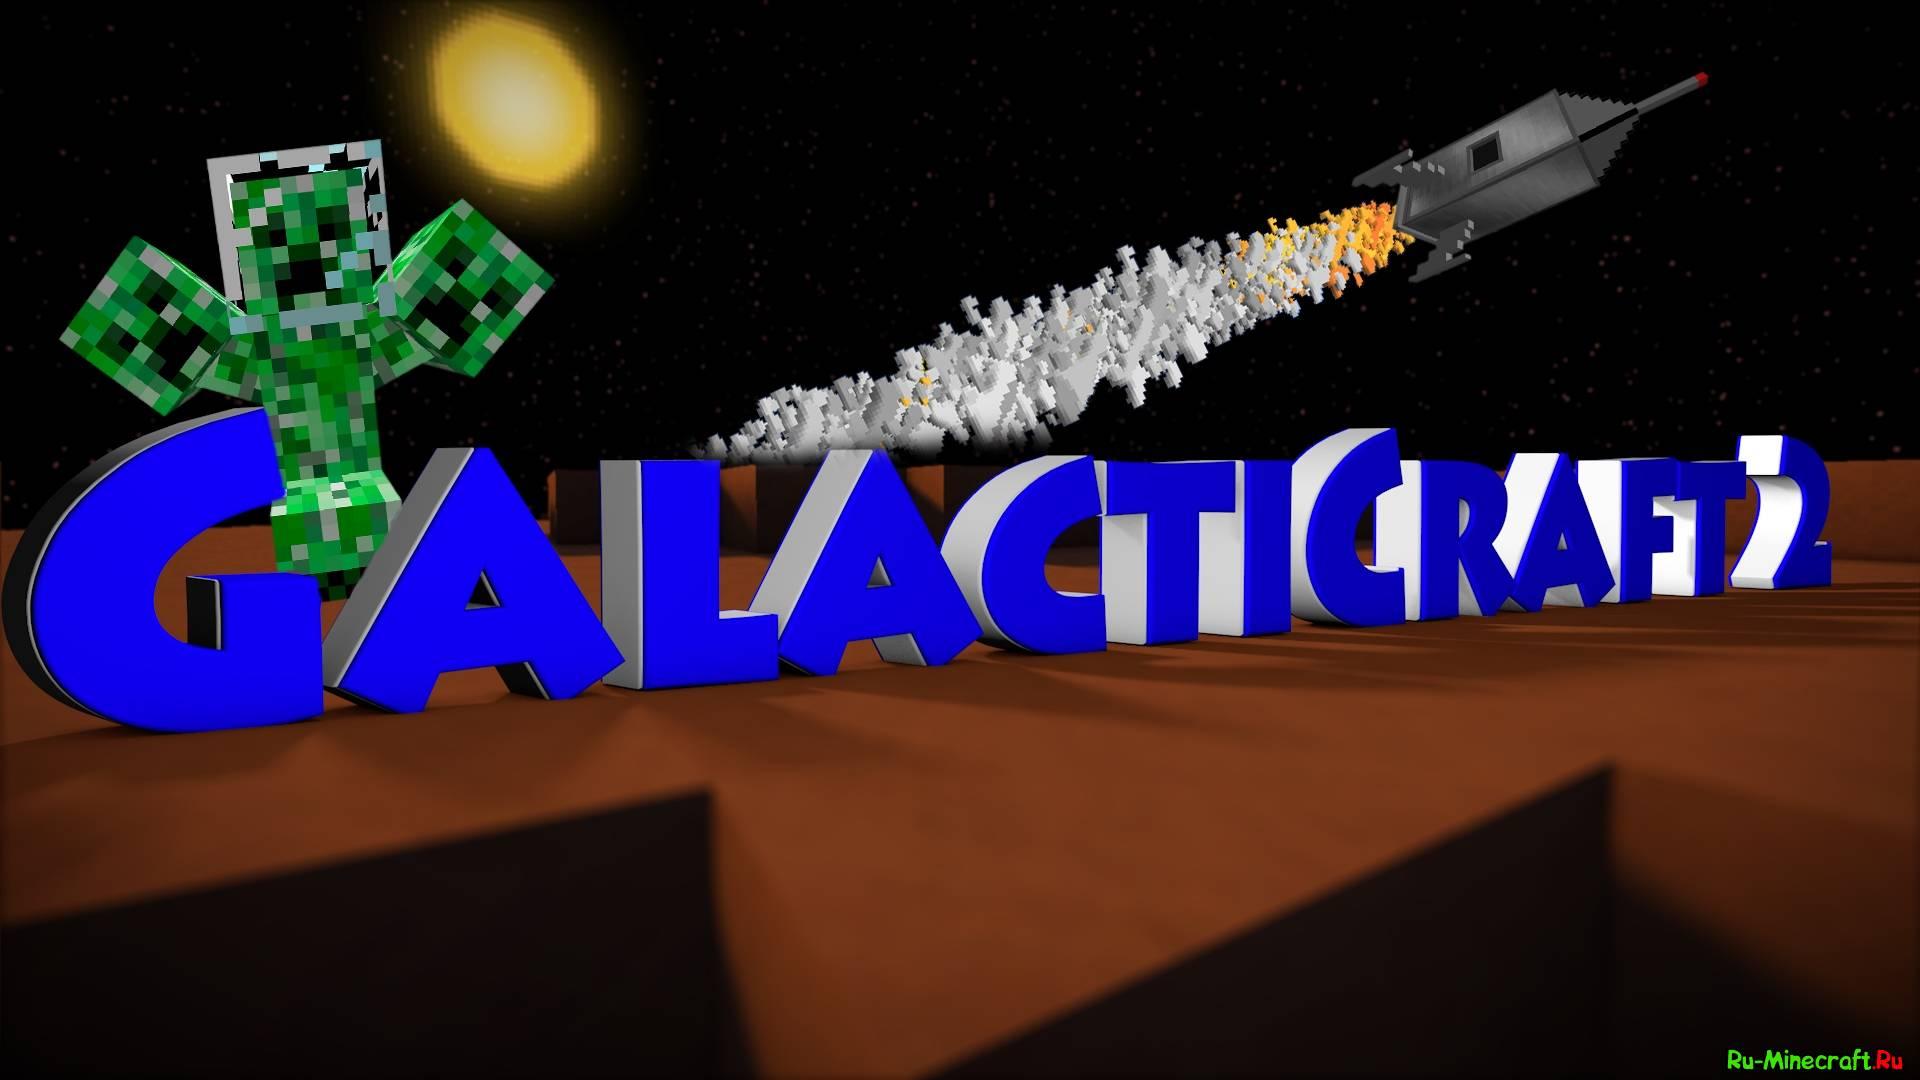 Galacticraft core 1.7.10